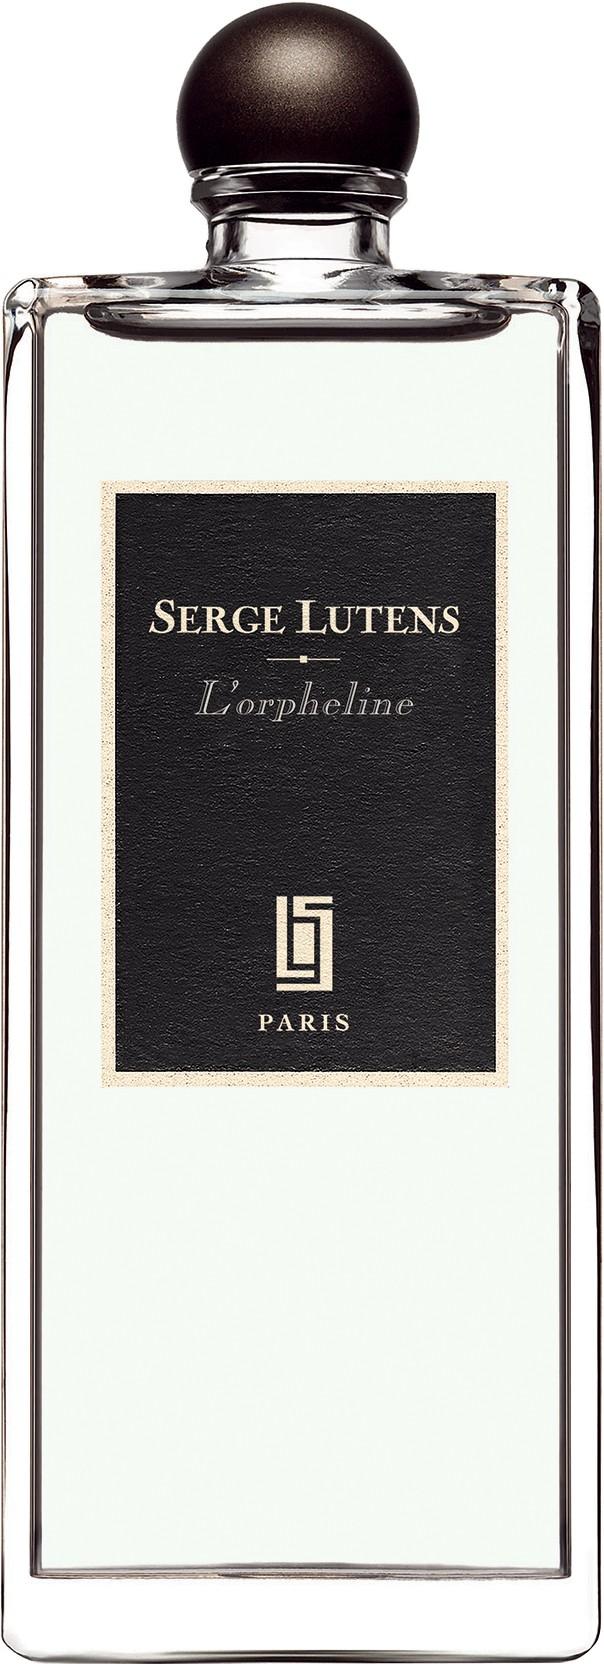 Serge Lutens L'orpheline аромат для мужчин и женщин